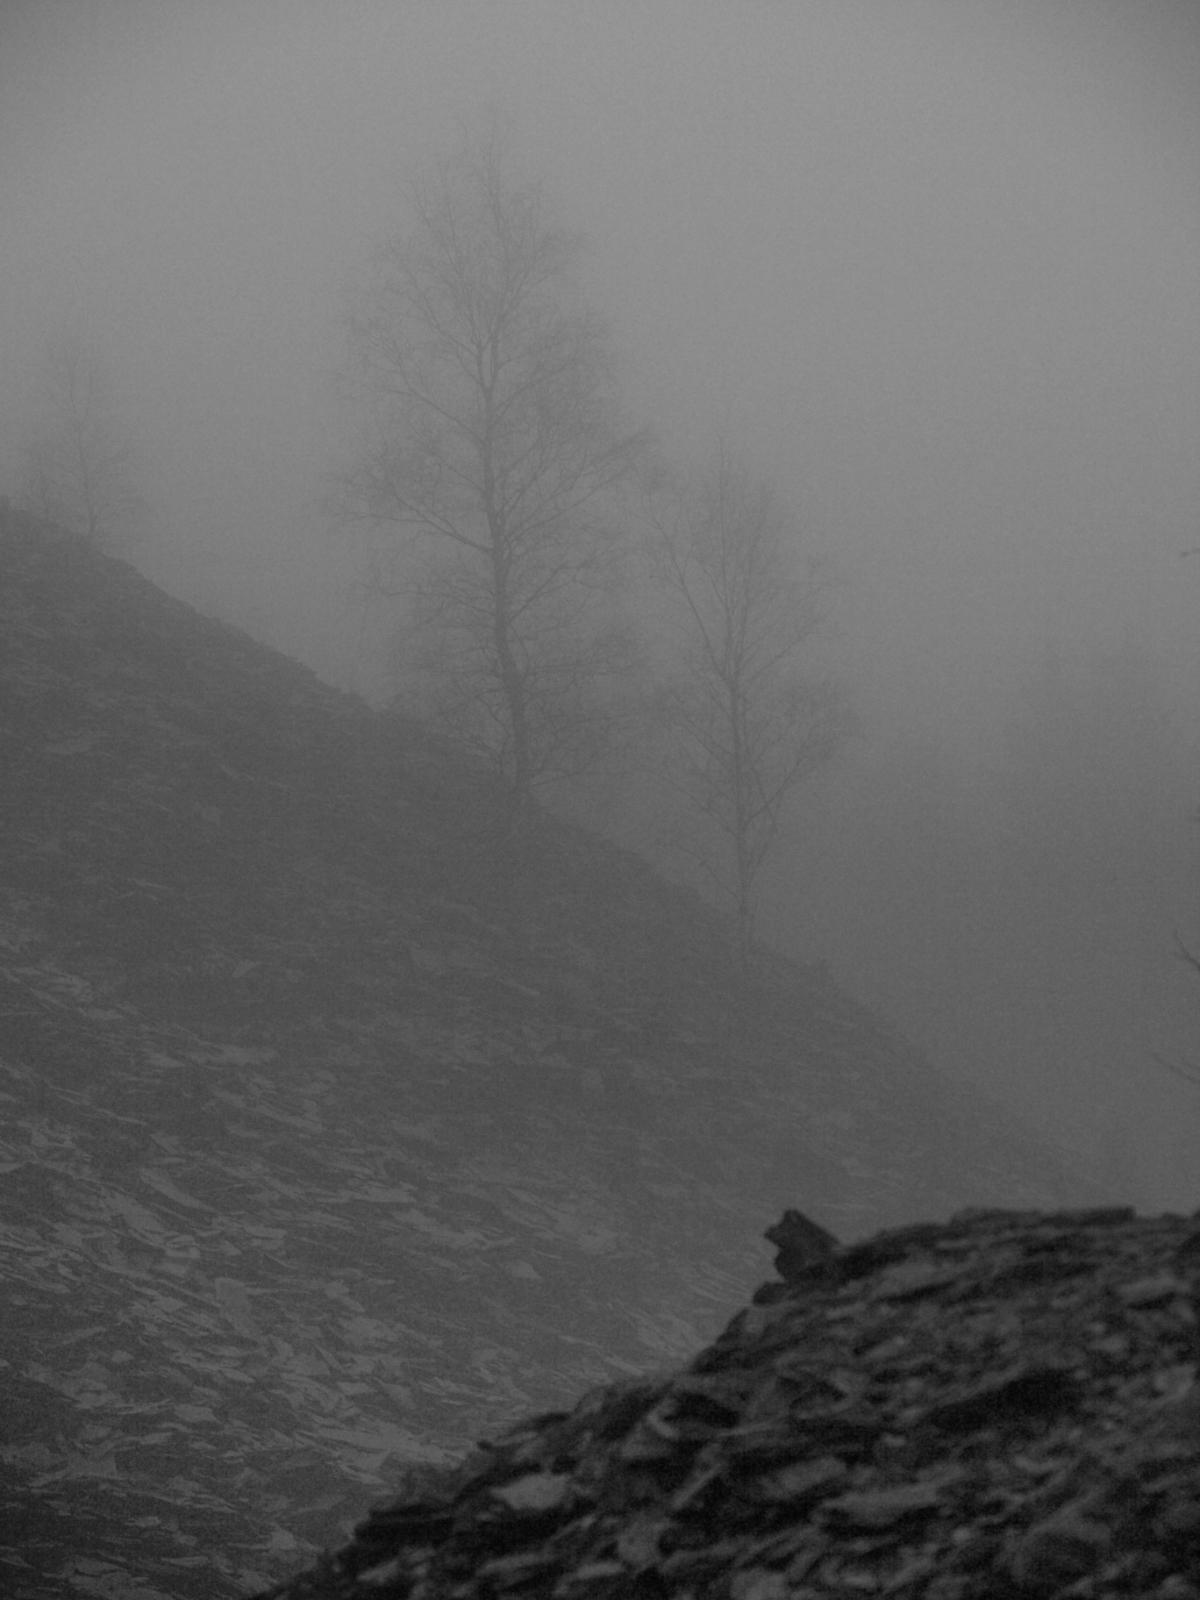 Schieferhalde im Nebel